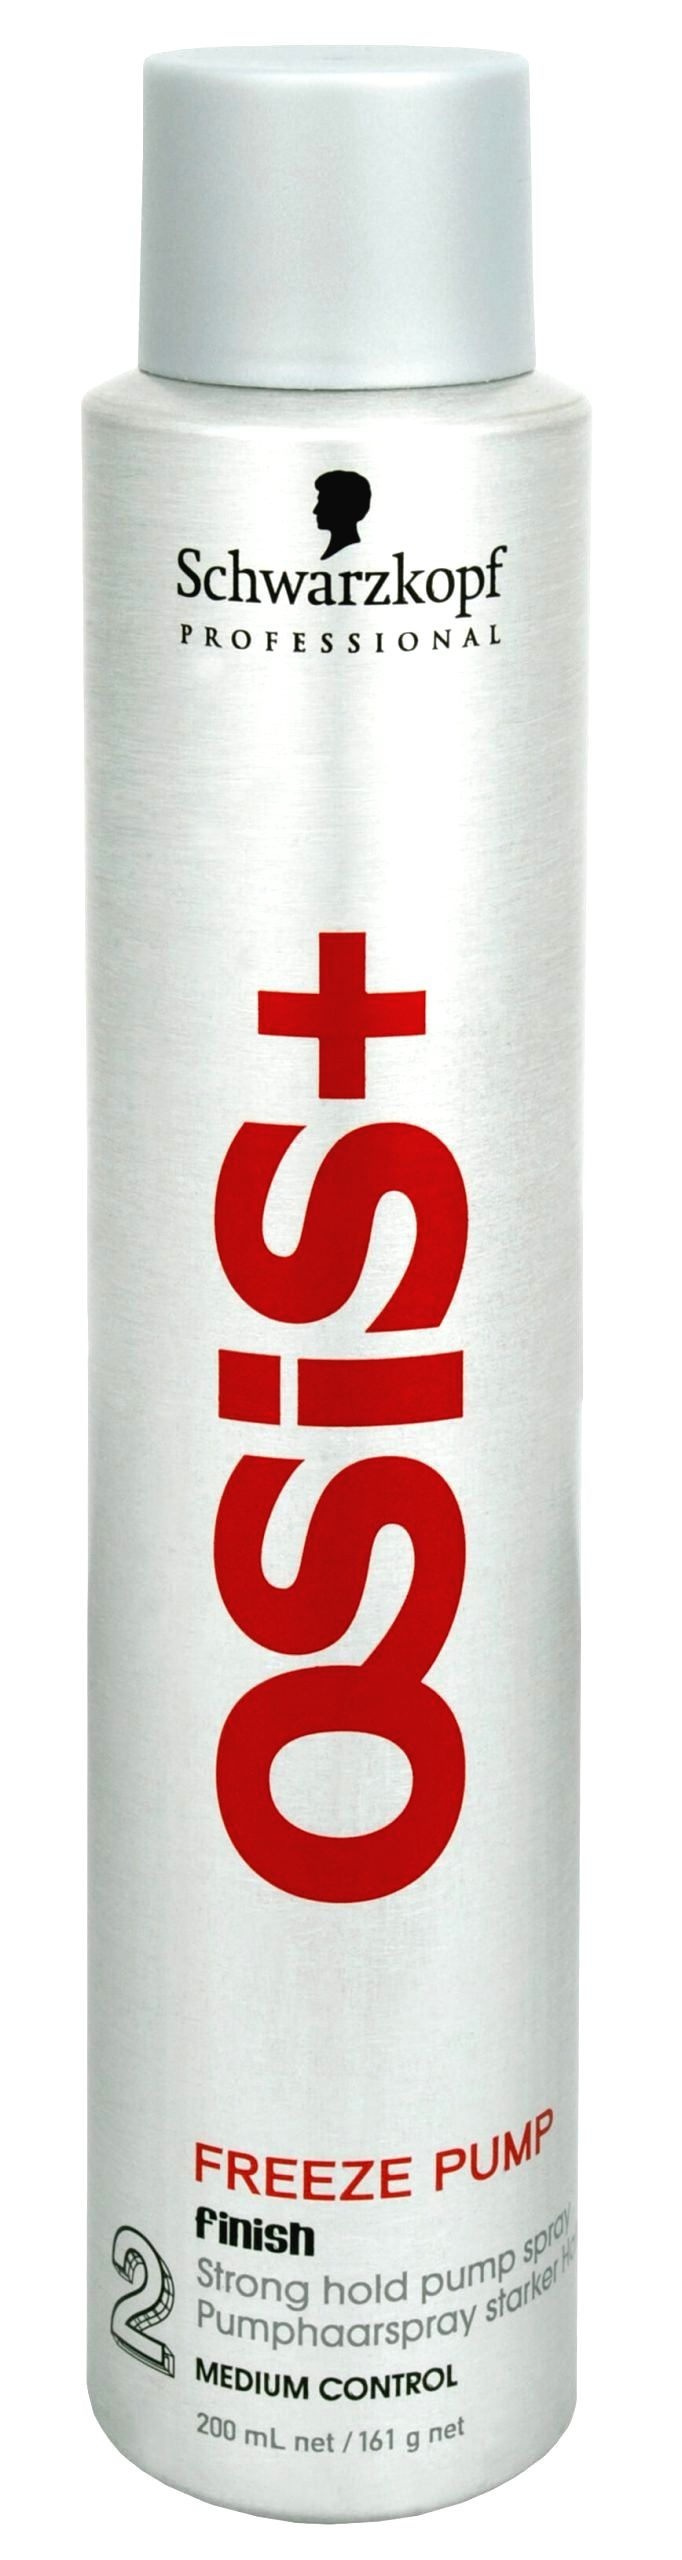 Schwarzkopf Professional Super silný vlasový sprej Freeze Pump 200 ml